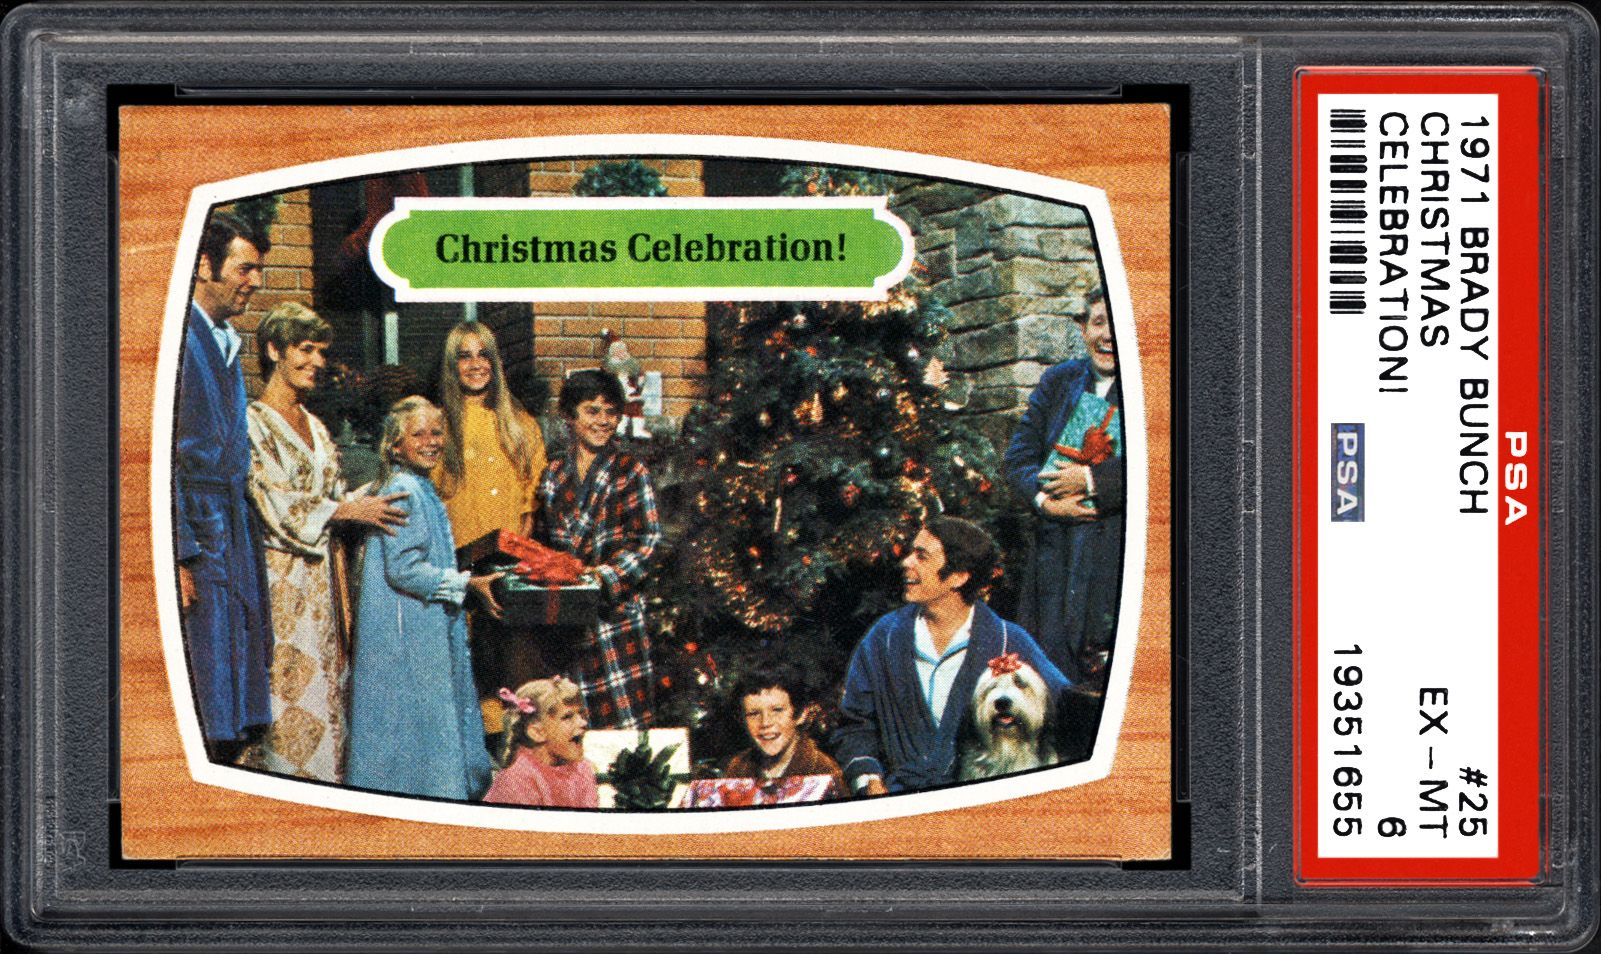 Brady Bunch Christmas Card.1971 Brady Bunch Christmas Celebration Psa Cardfacts